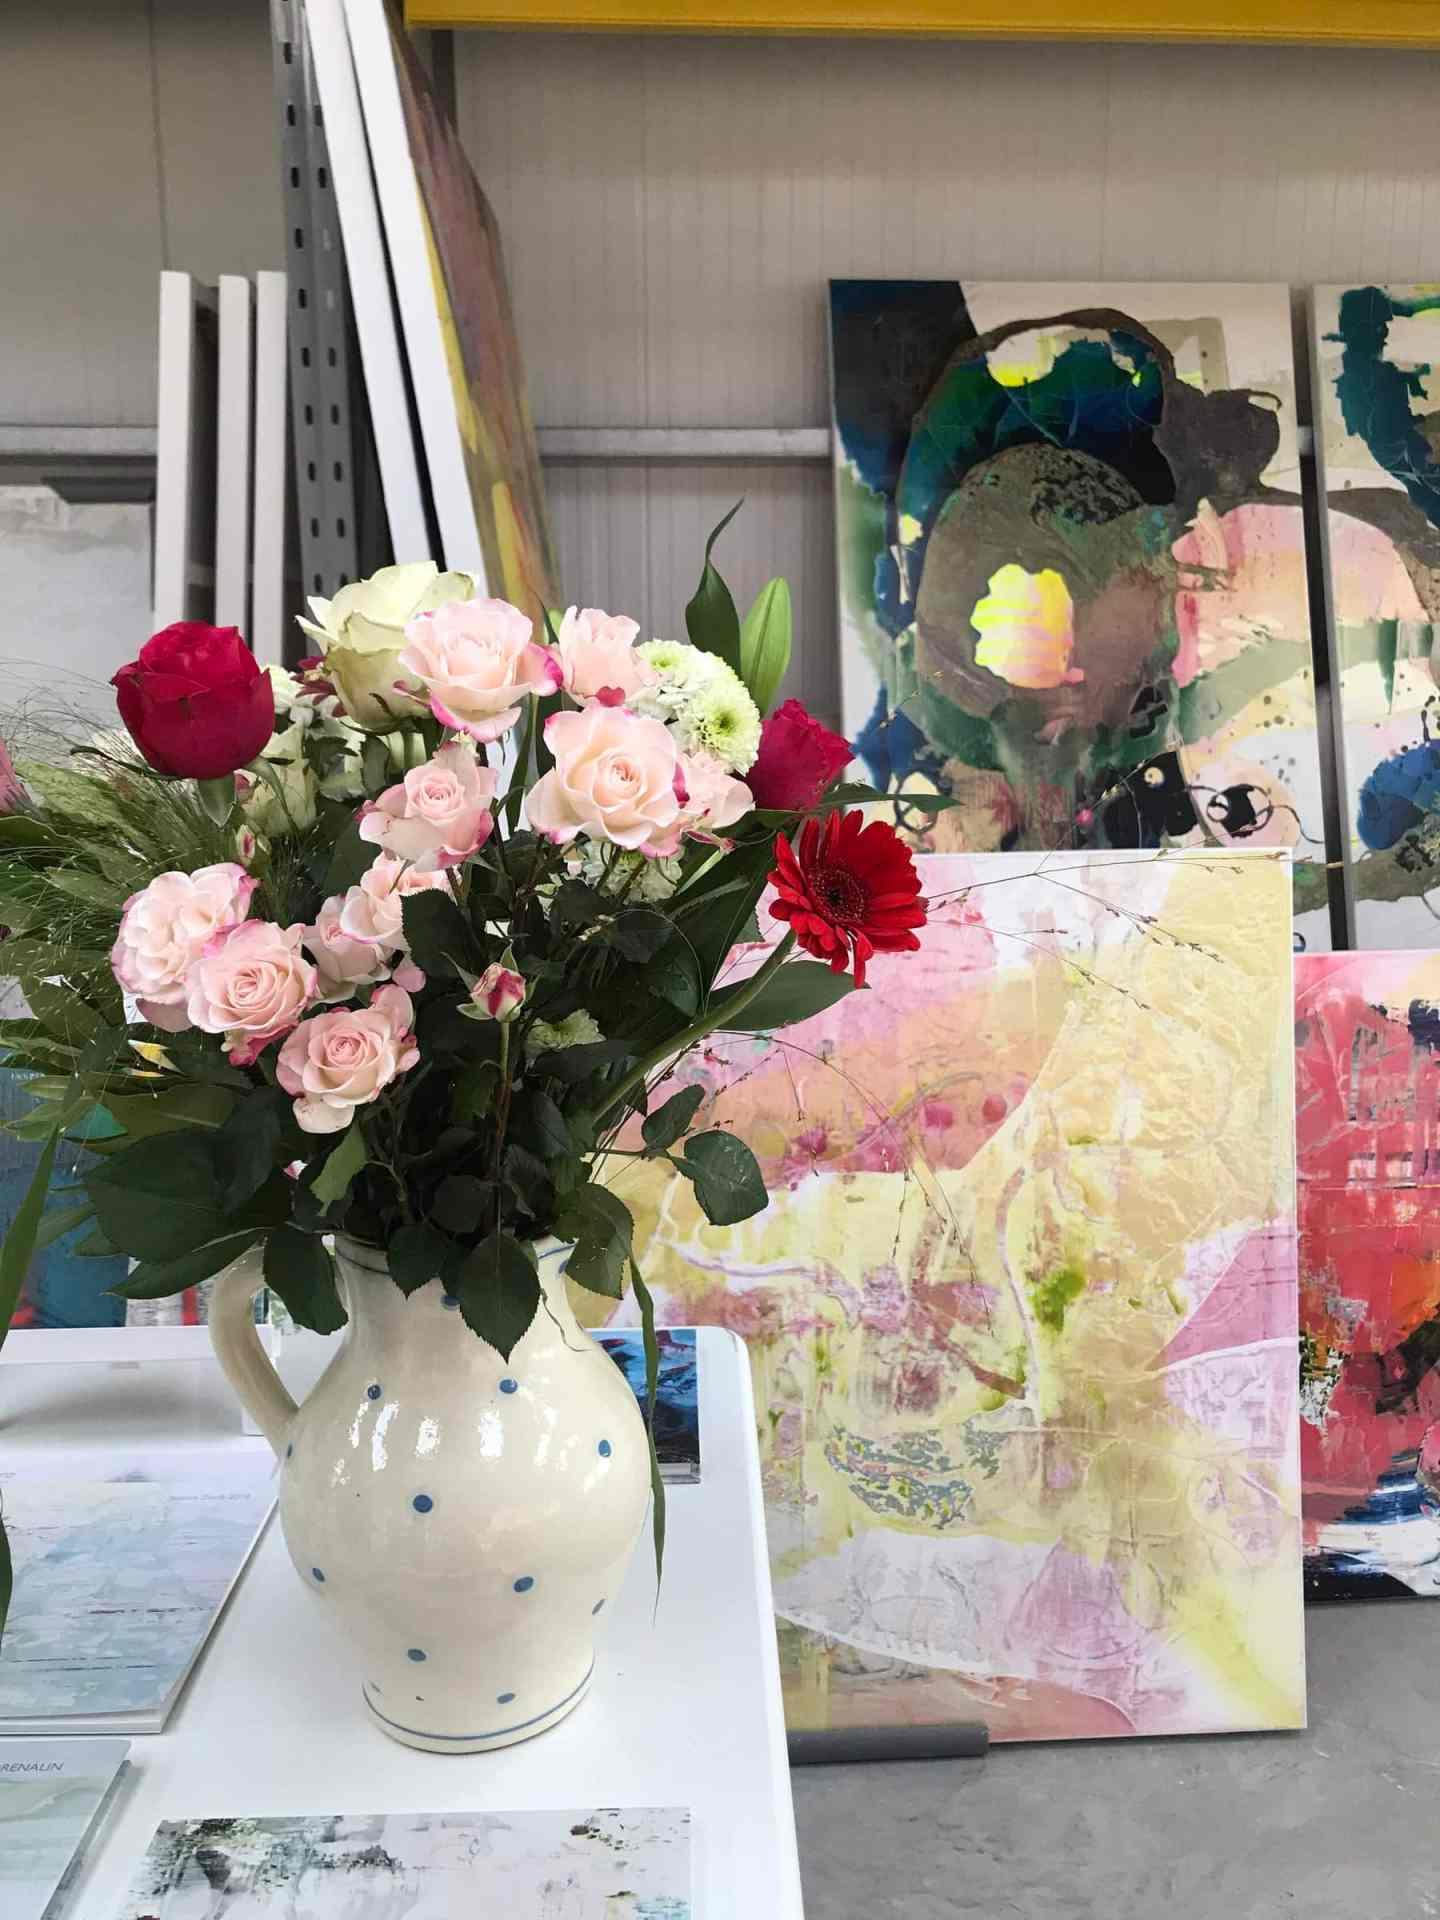 Beautiful floral displays everywhere